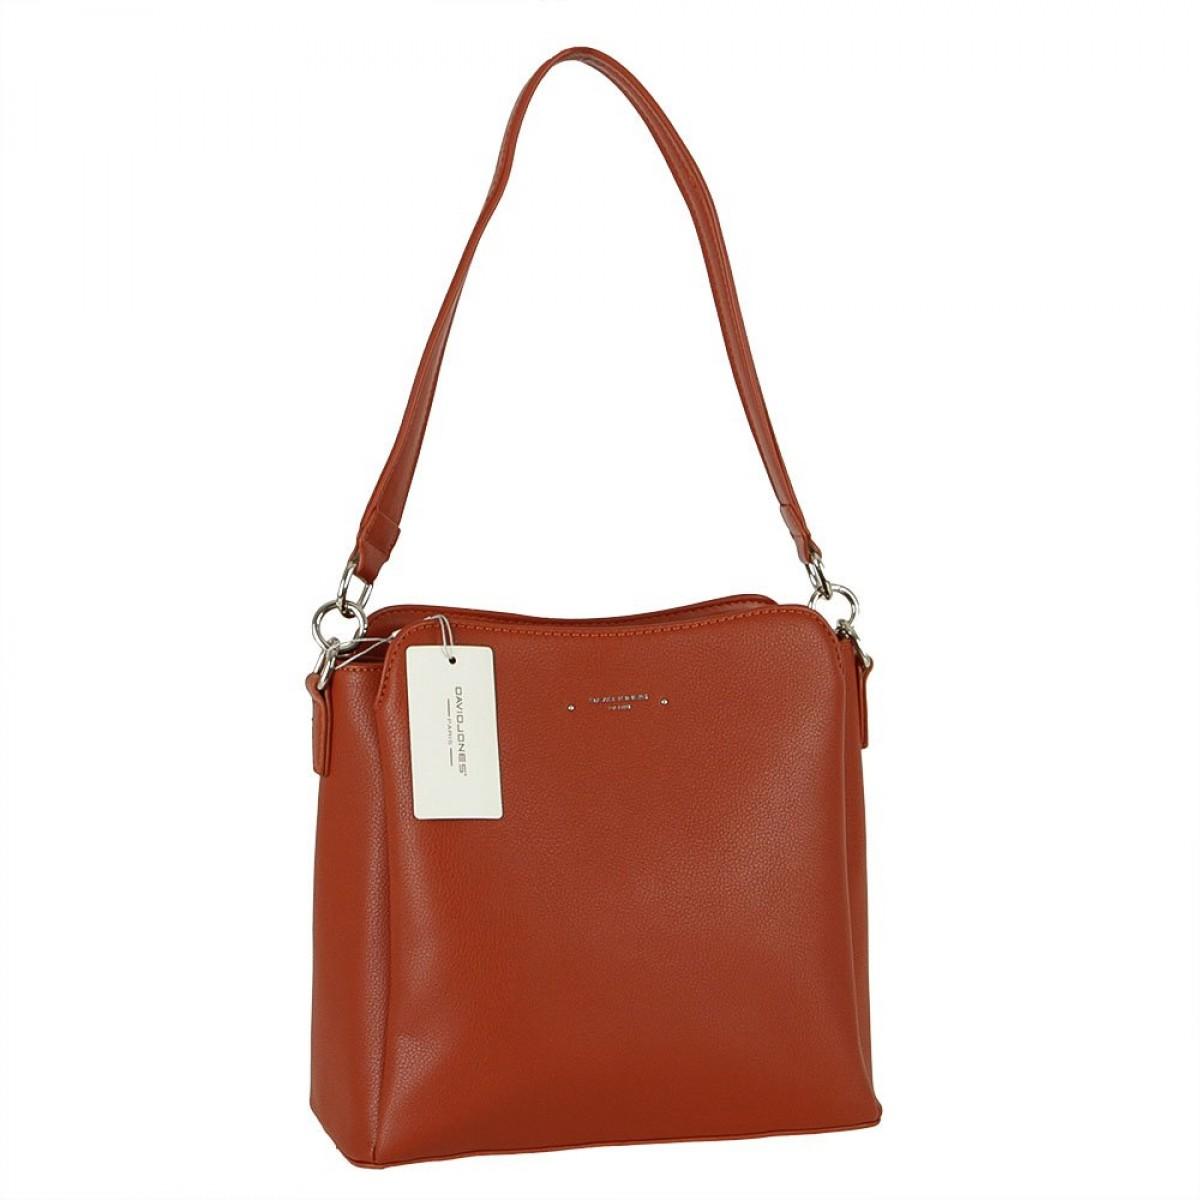 Жіноча сумка David Jones 6417-2A SIENNA